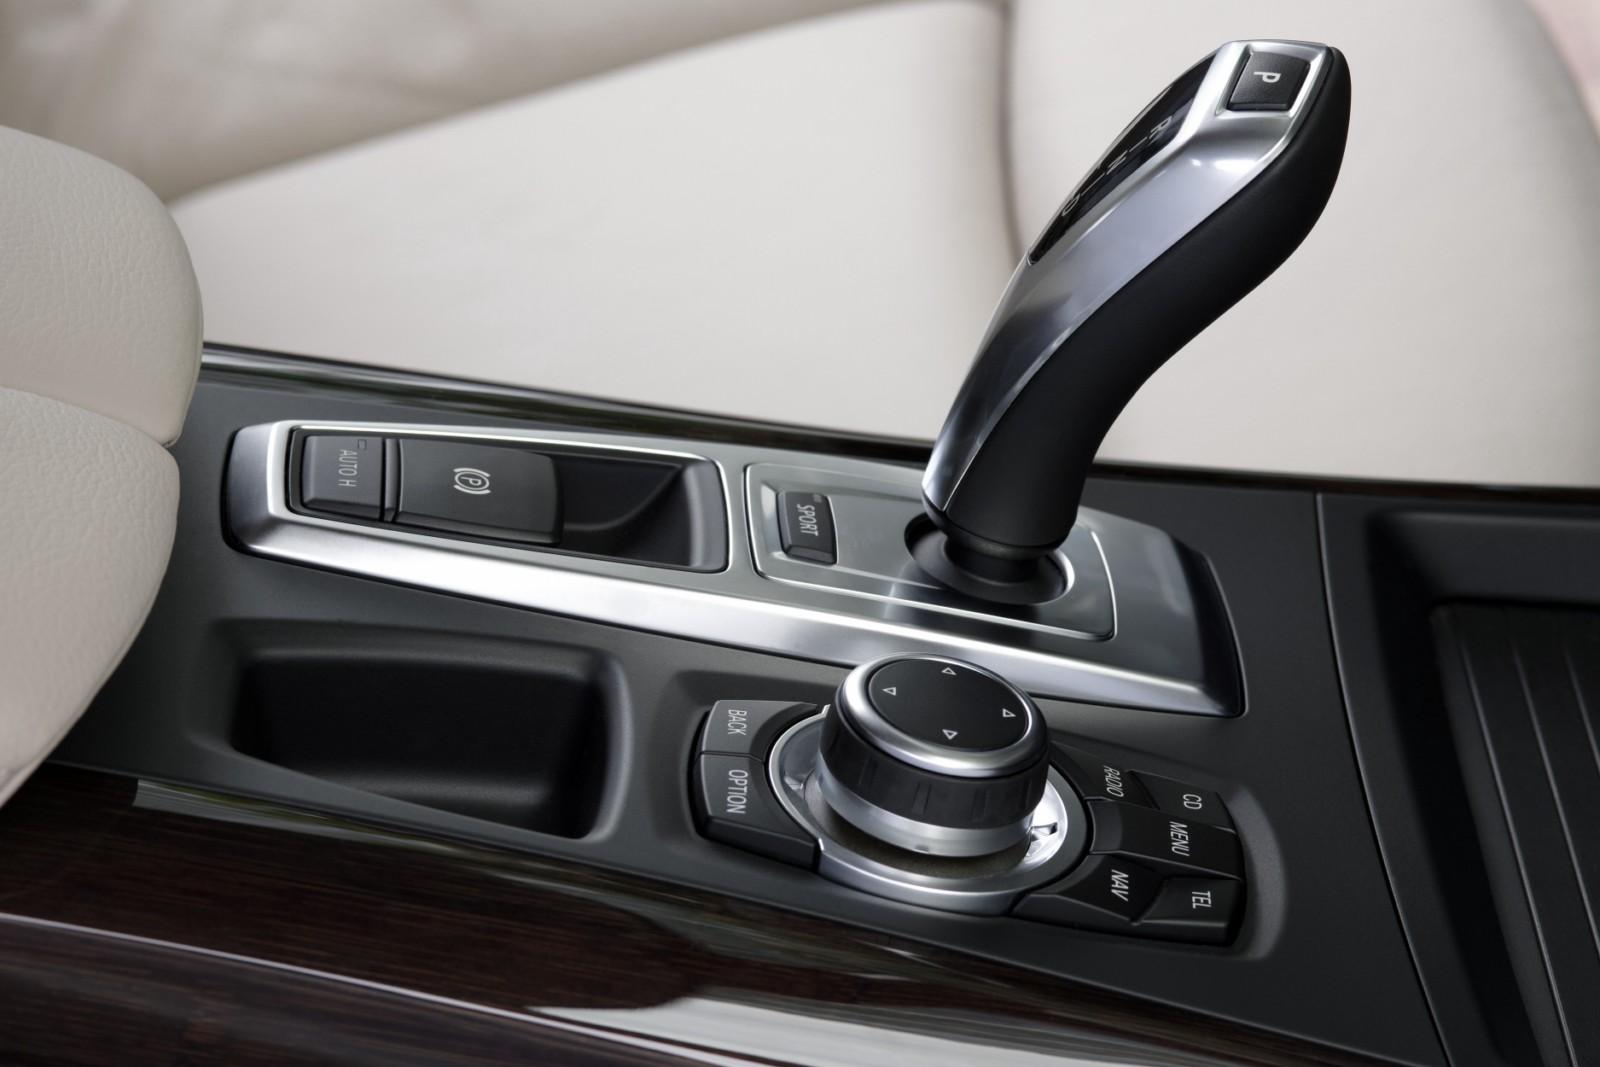 premiere 2011 bmw x5 facelift lci rh bmwblog com BMW 2002 4 Speed Manual Transmission 02 Neon Manual Transmission Fill